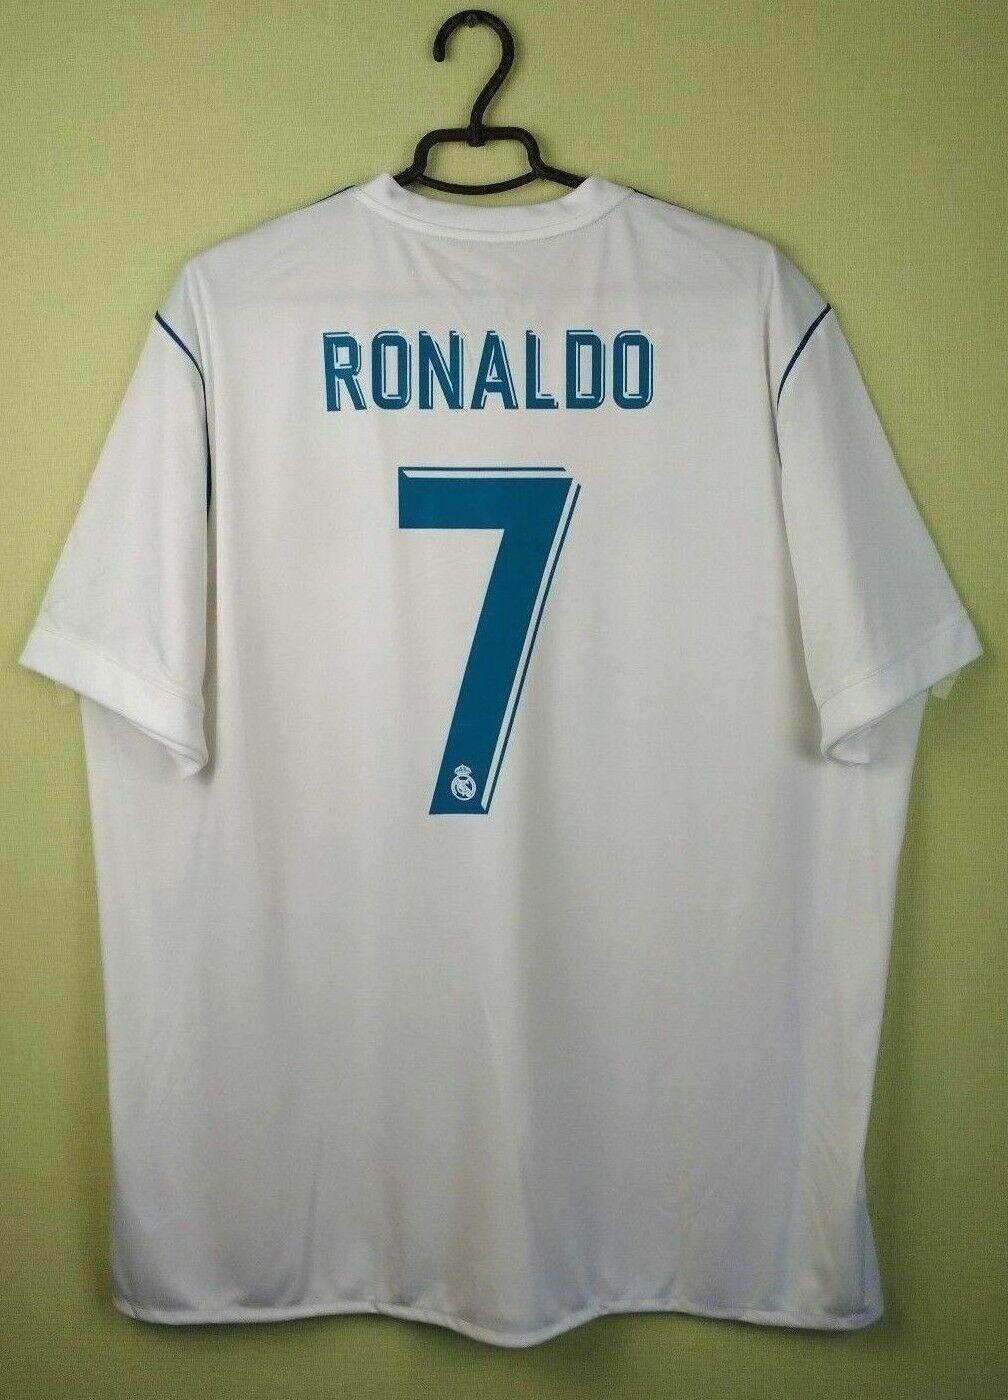 Ronaldo Real Madrid jersey 2XL 201718 Home adidas uomo shirt soccer AZ8059 55